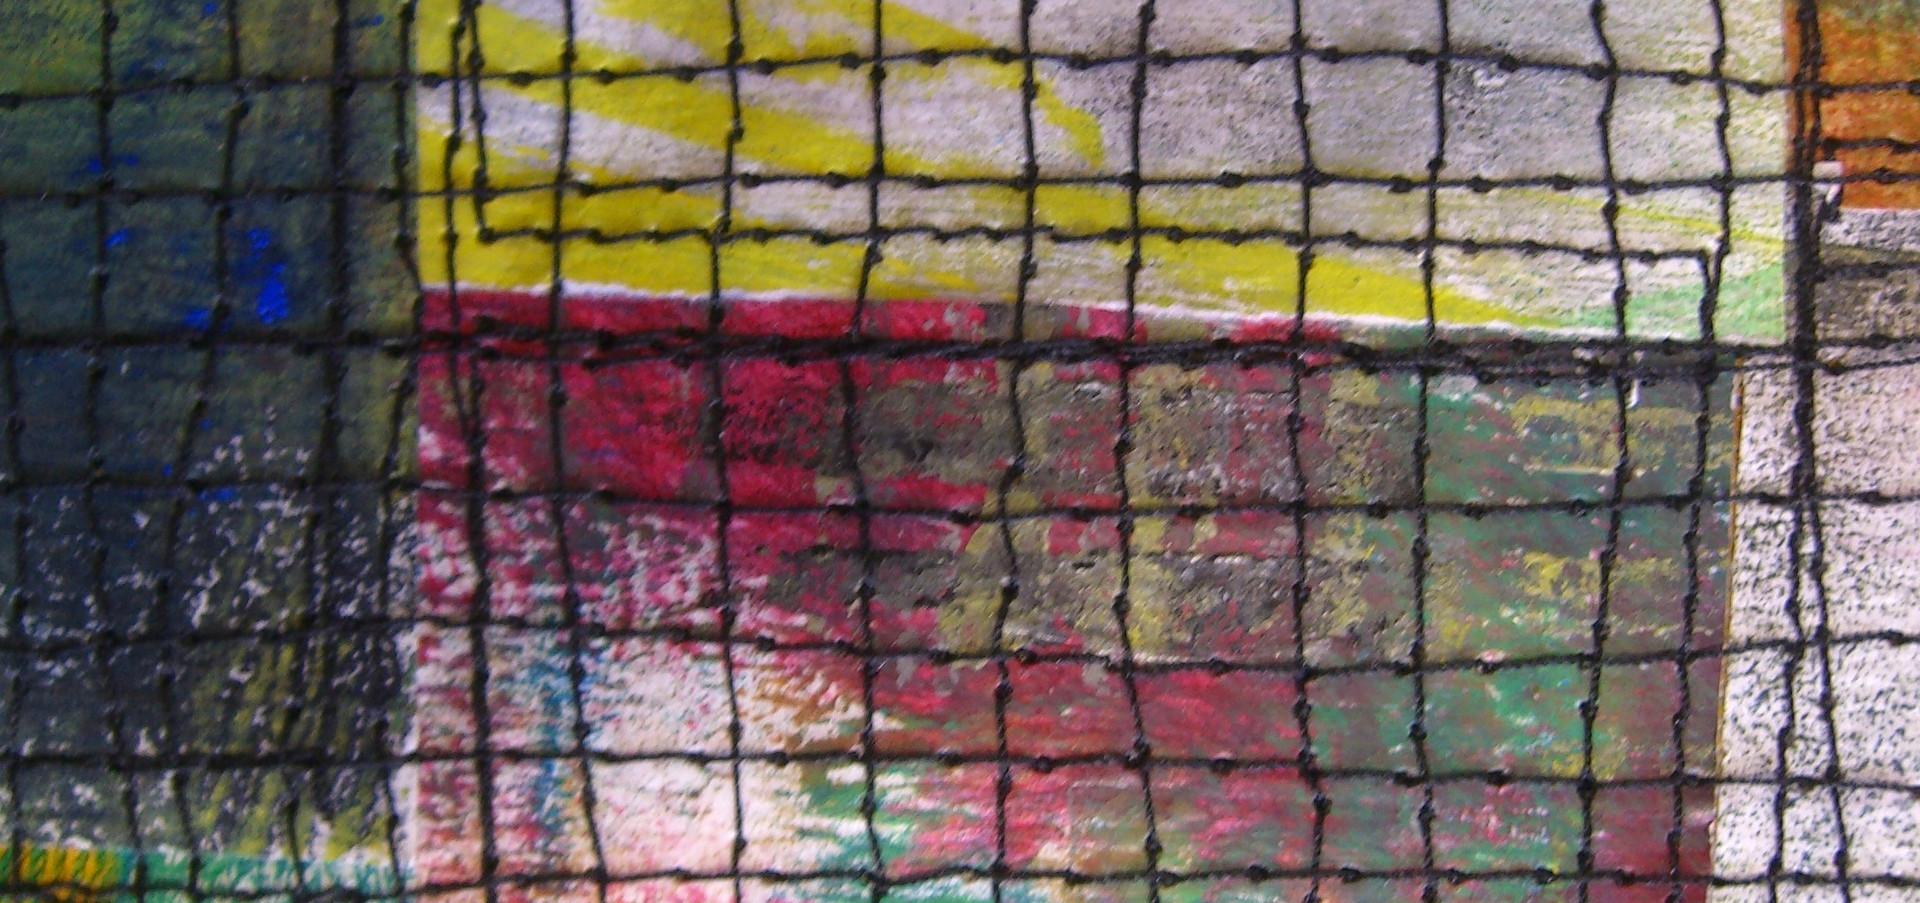 Painted Paper Quilt #5 (Detail)